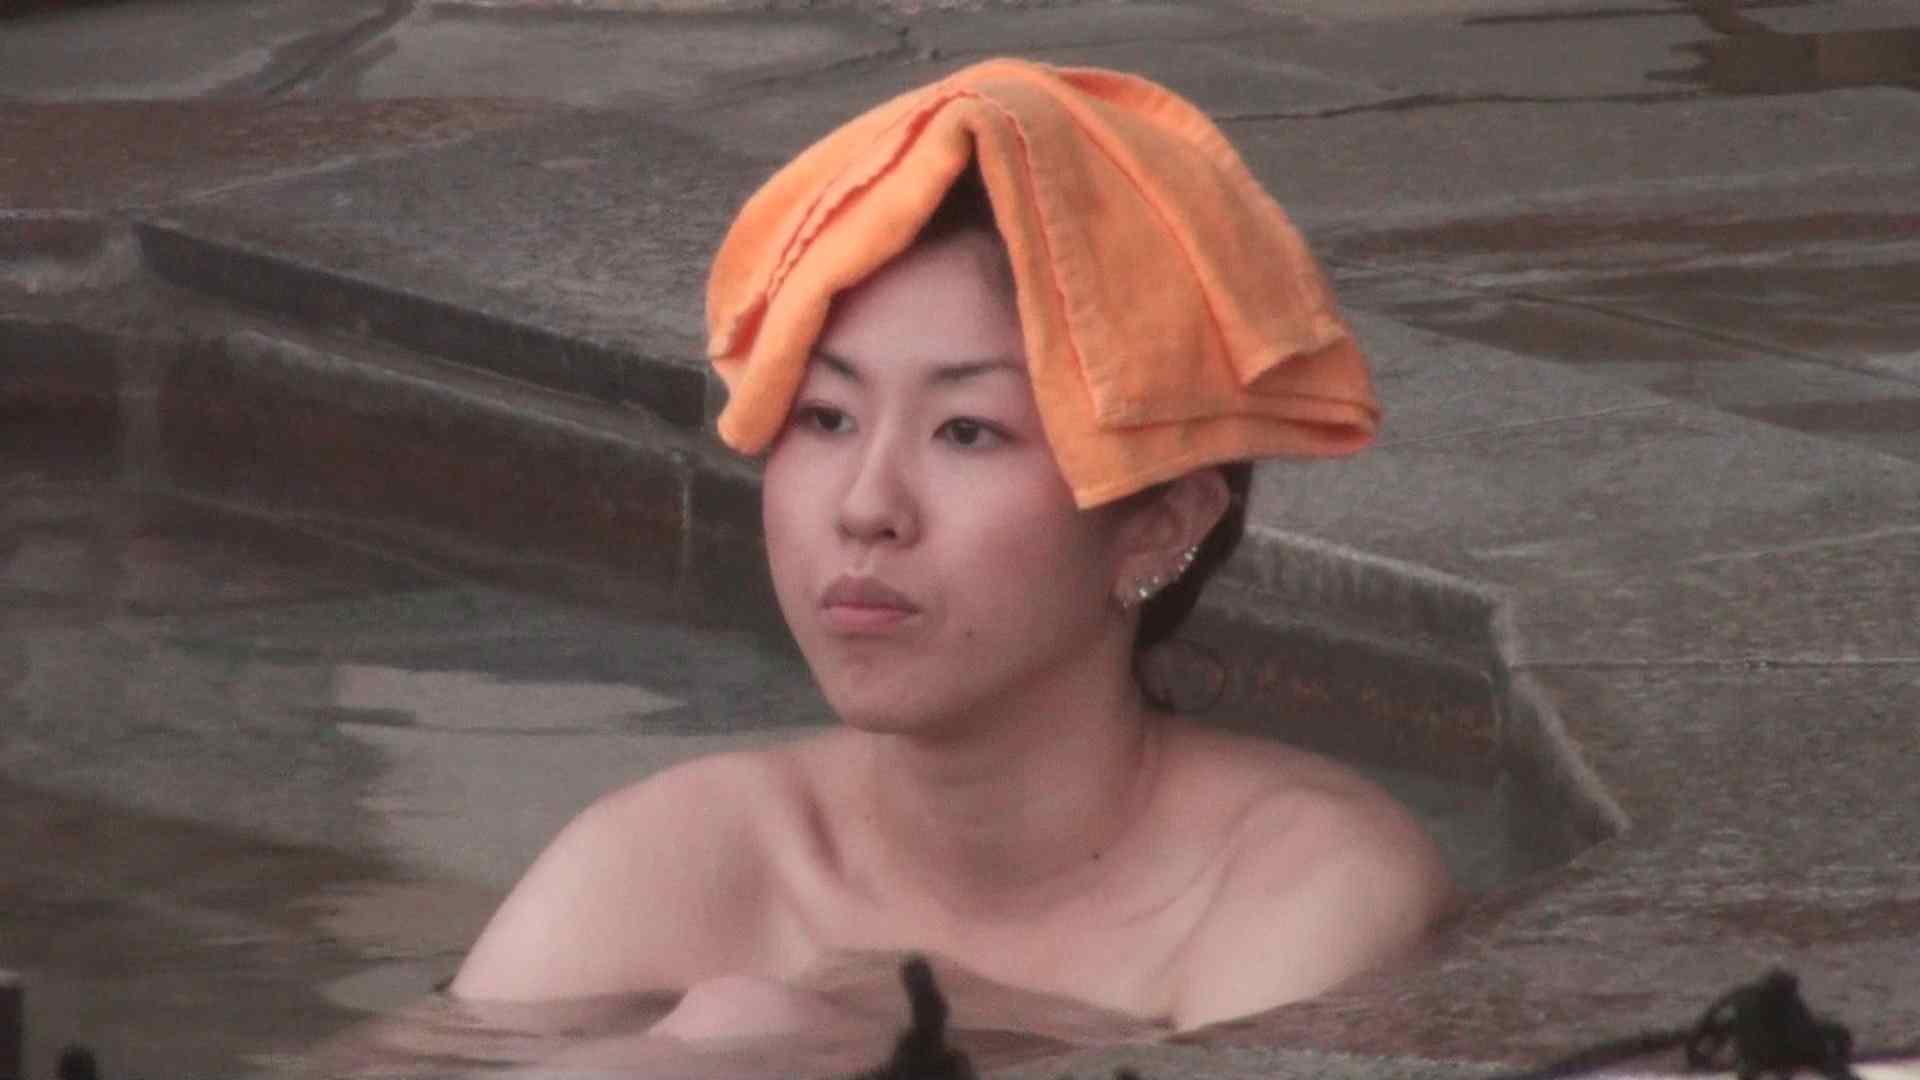 Aquaな露天風呂Vol.135 盗撮師作品  105pic 84